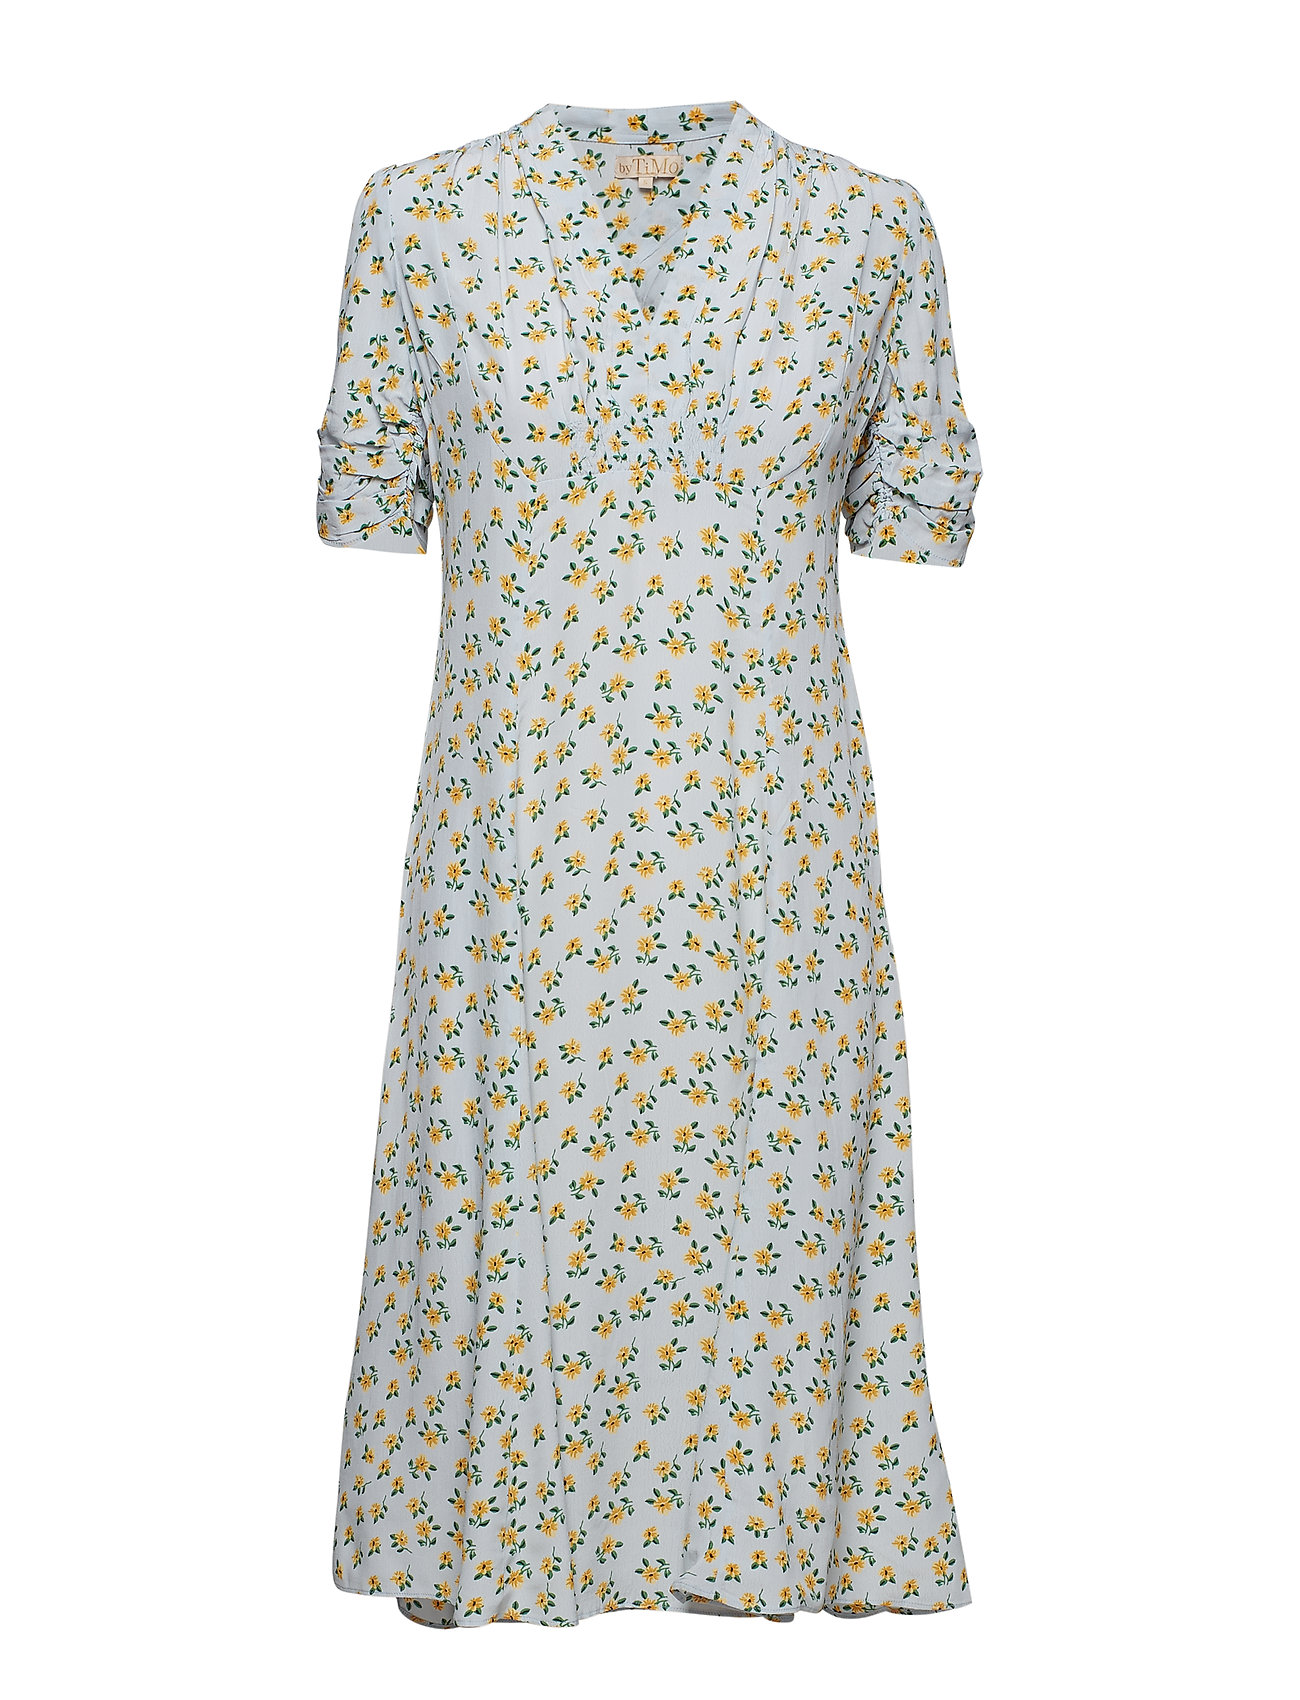 Image of Day Dress Knælang Kjole Blå BY TI MO (3118026635)